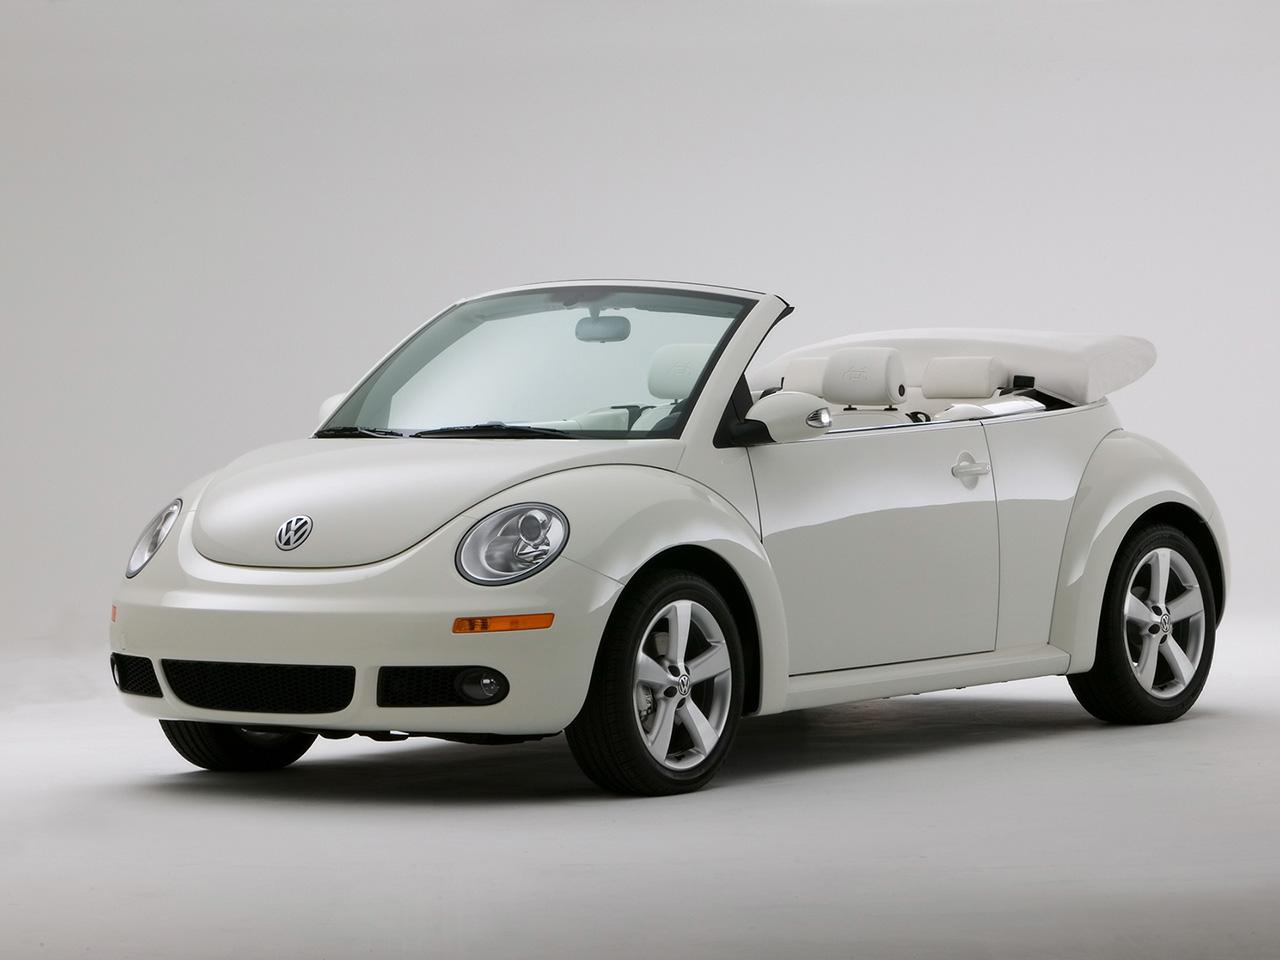 sold in triple il veh volkswagen white new villa beetle convertible